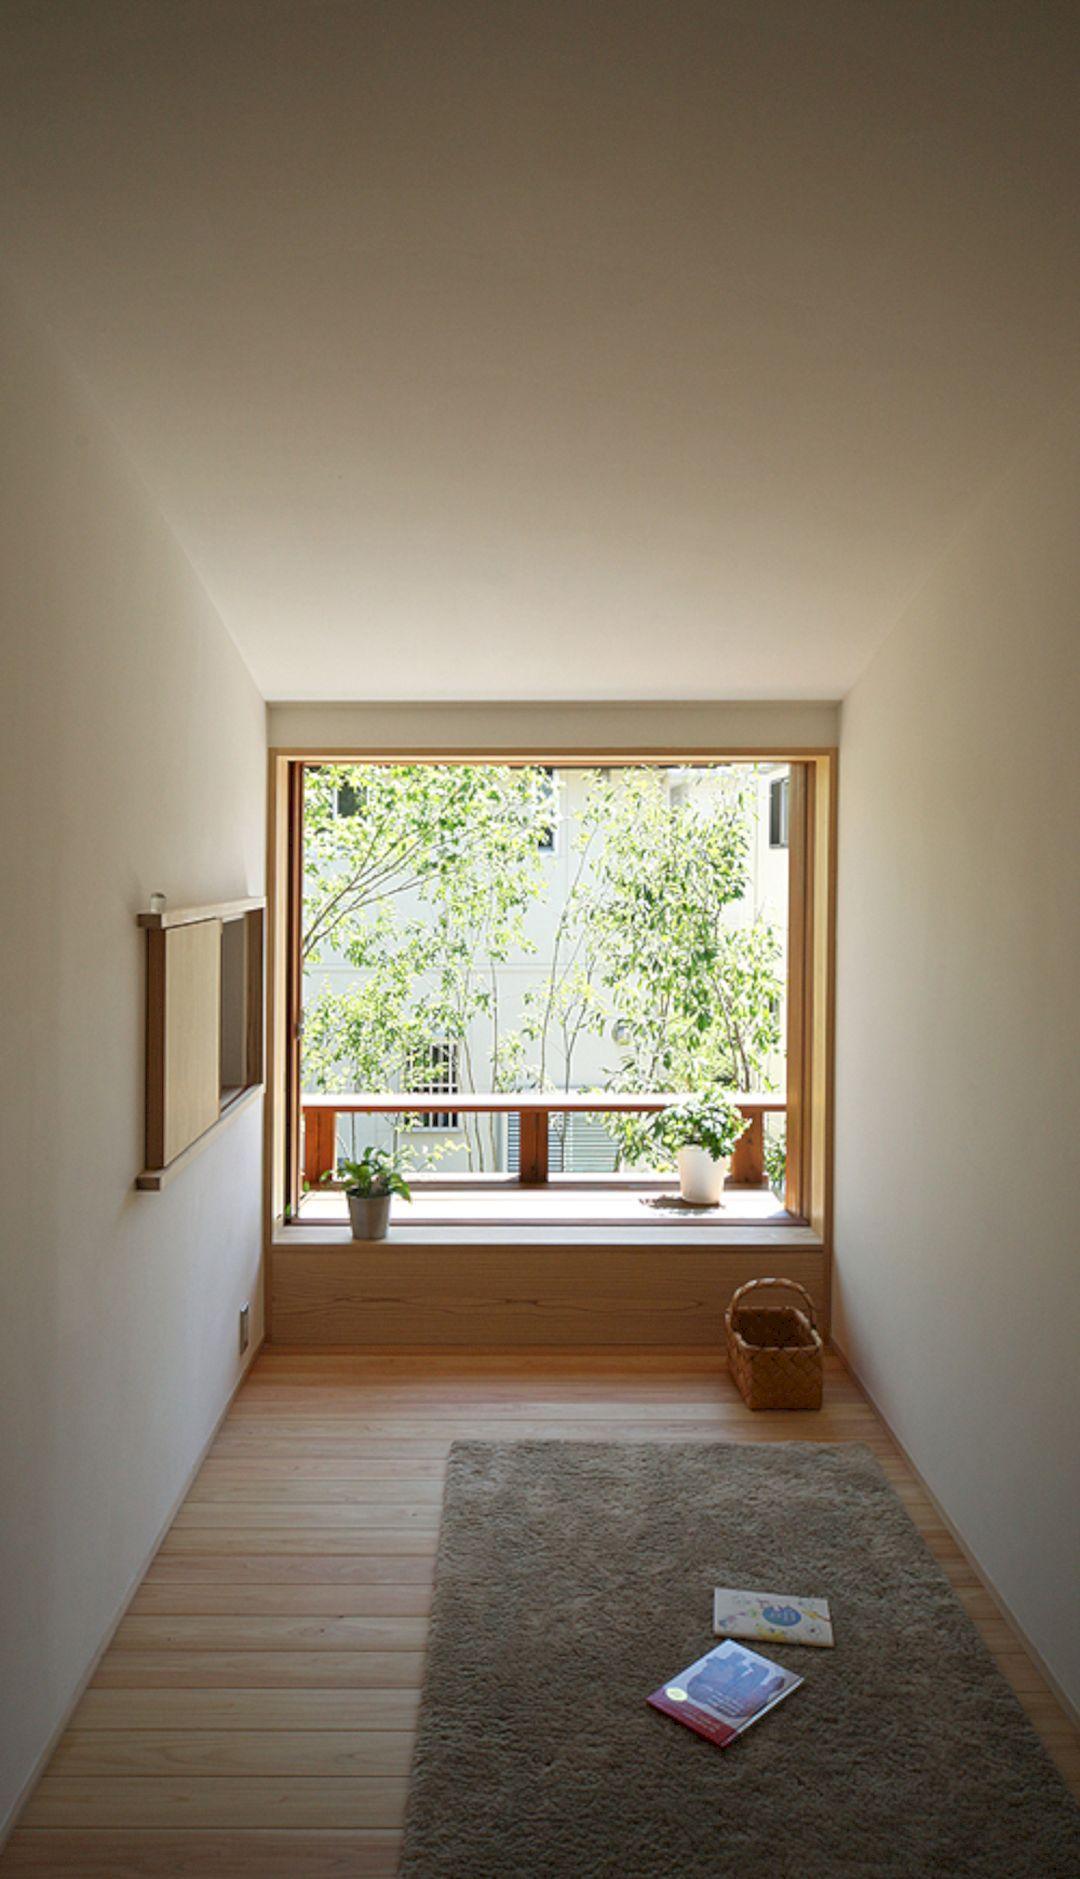 Wonderful Modern Interior Design Inspirations  Https://www.futuristarchitecture.com/23228